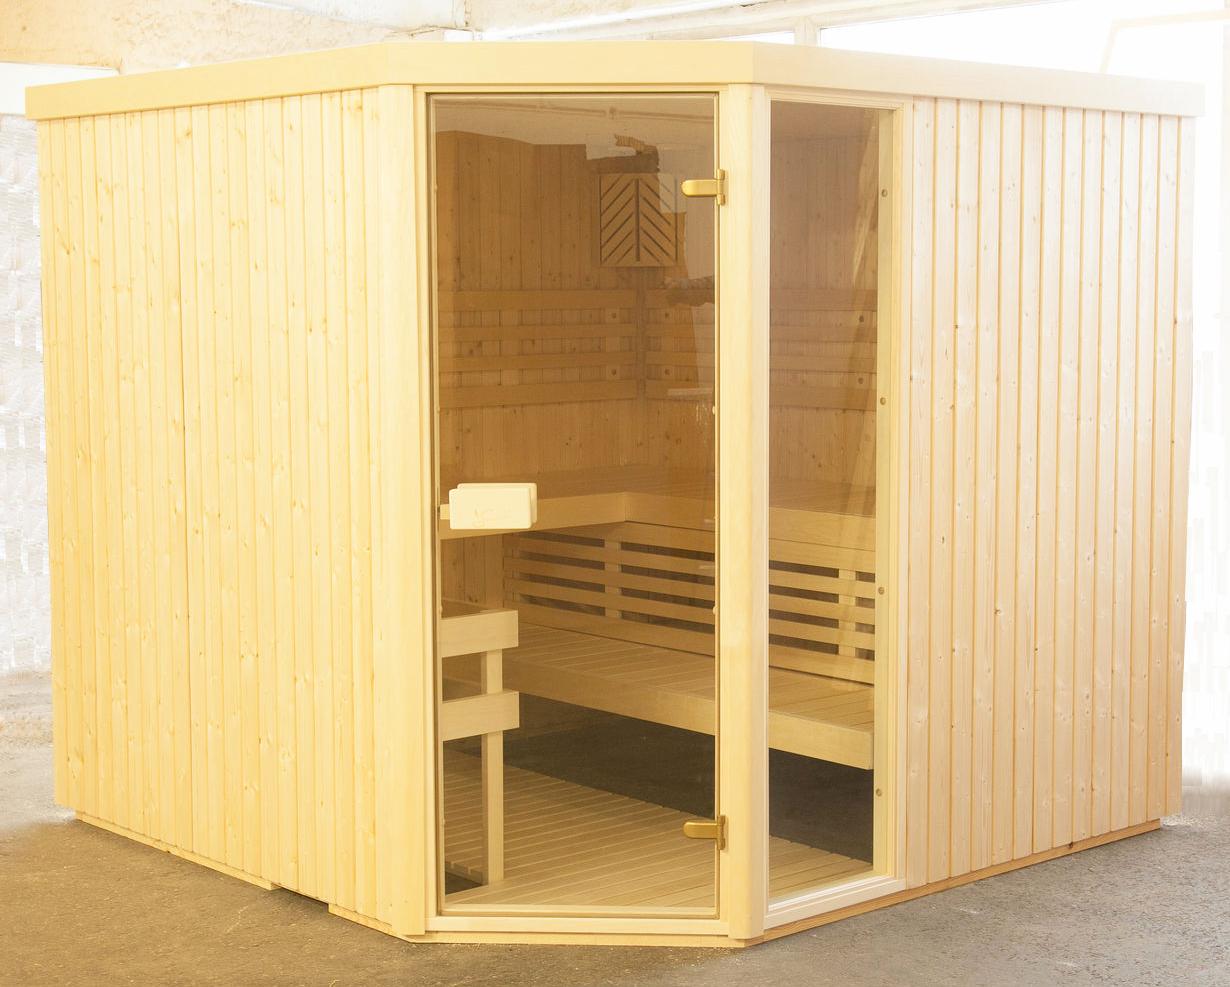 b ware finntherm sauna innenkabine. Black Bedroom Furniture Sets. Home Design Ideas